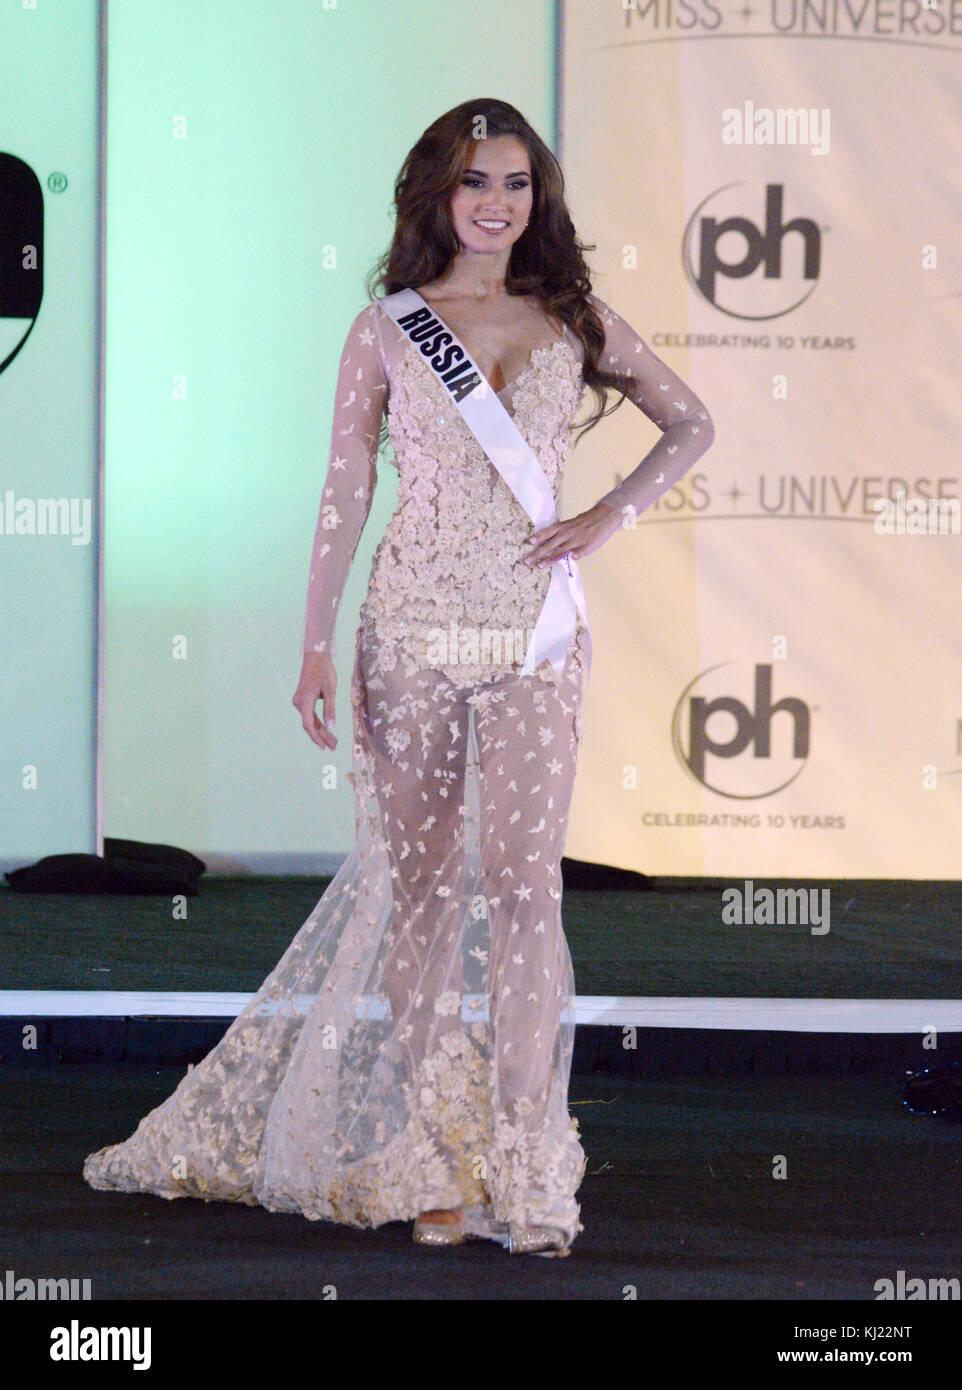 Las Vegas, Nevada, USA. 20th Nov, 2017. Miss Universe Russia Kseniya ...